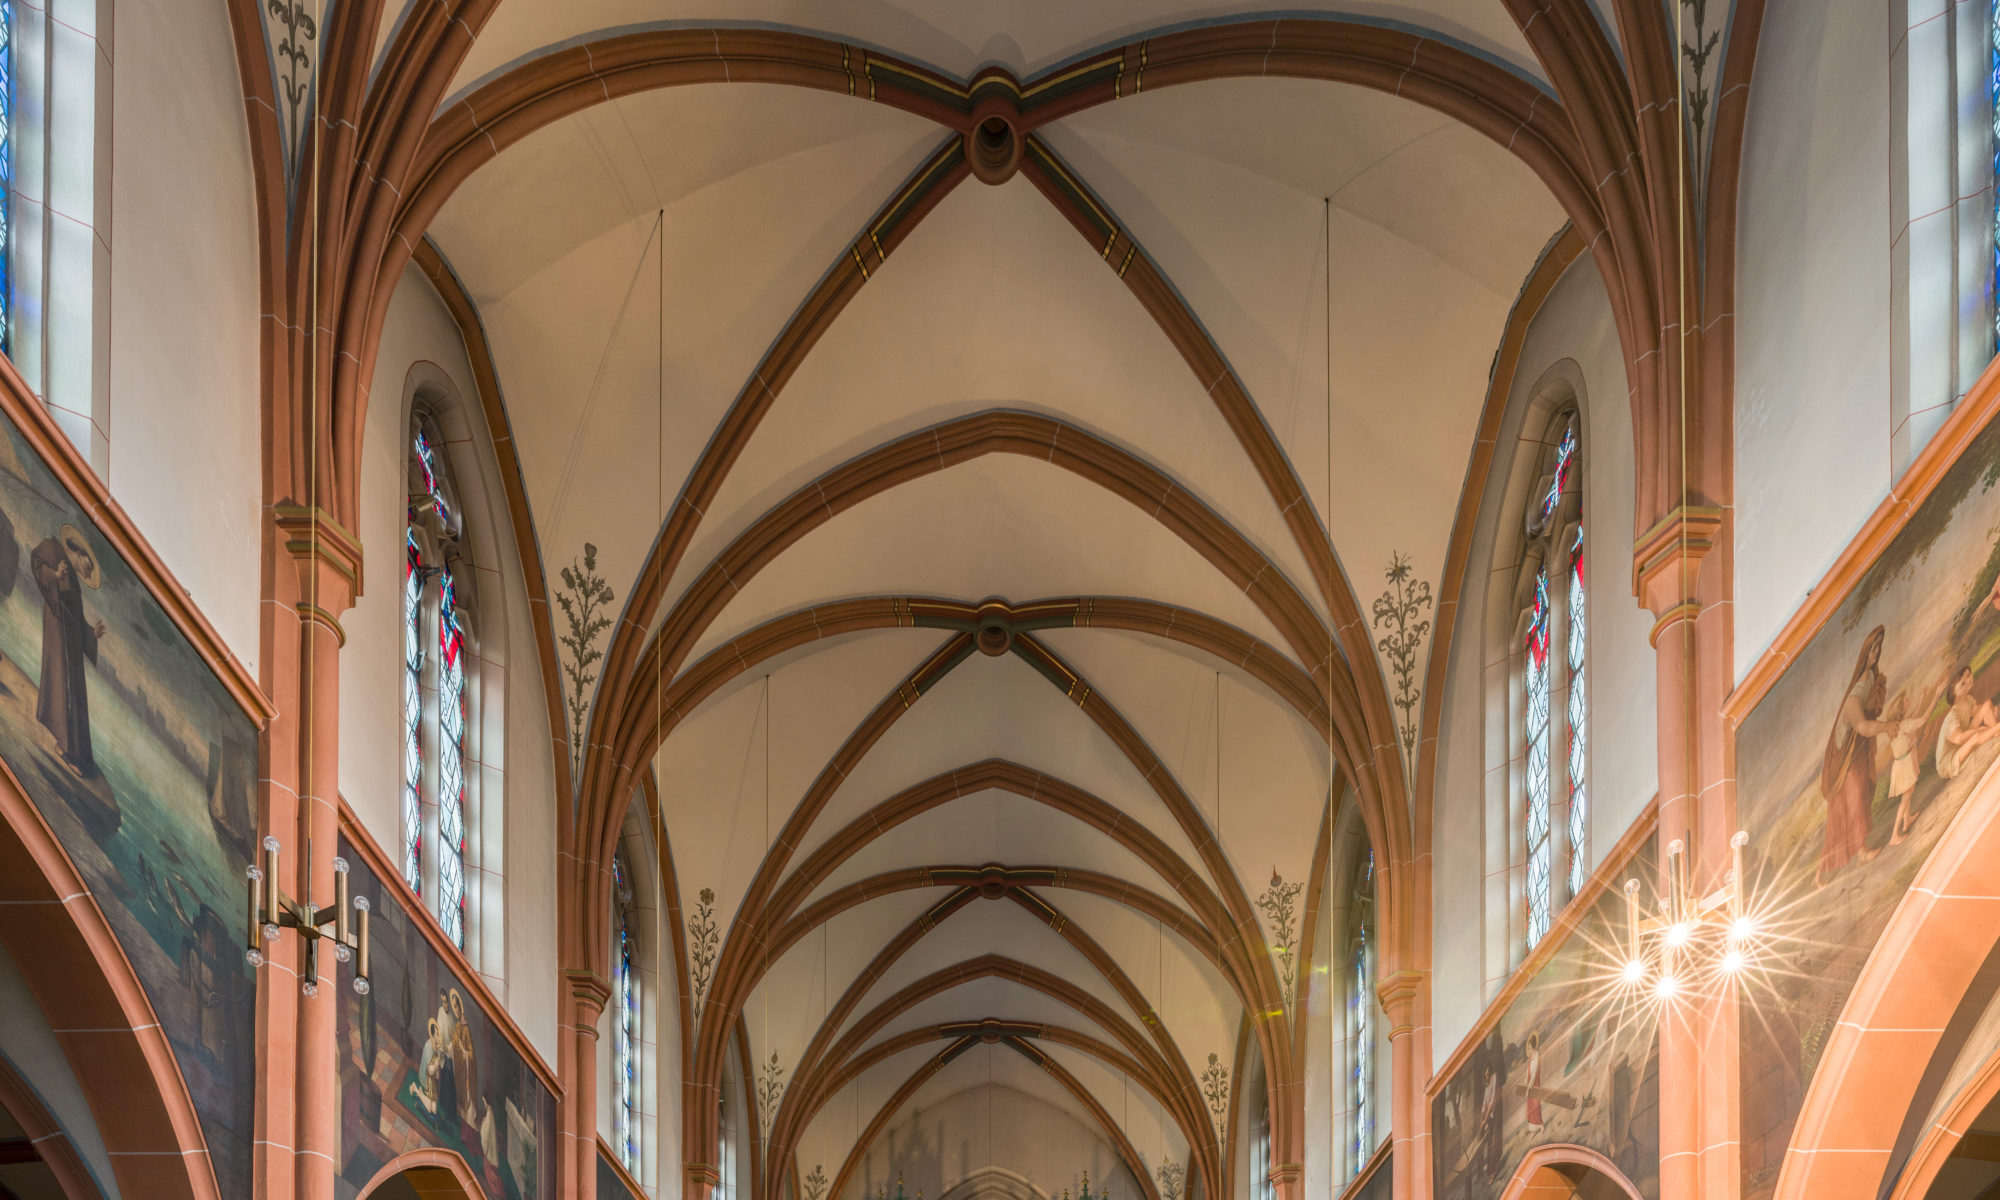 Unsere-Kirche-2030.de